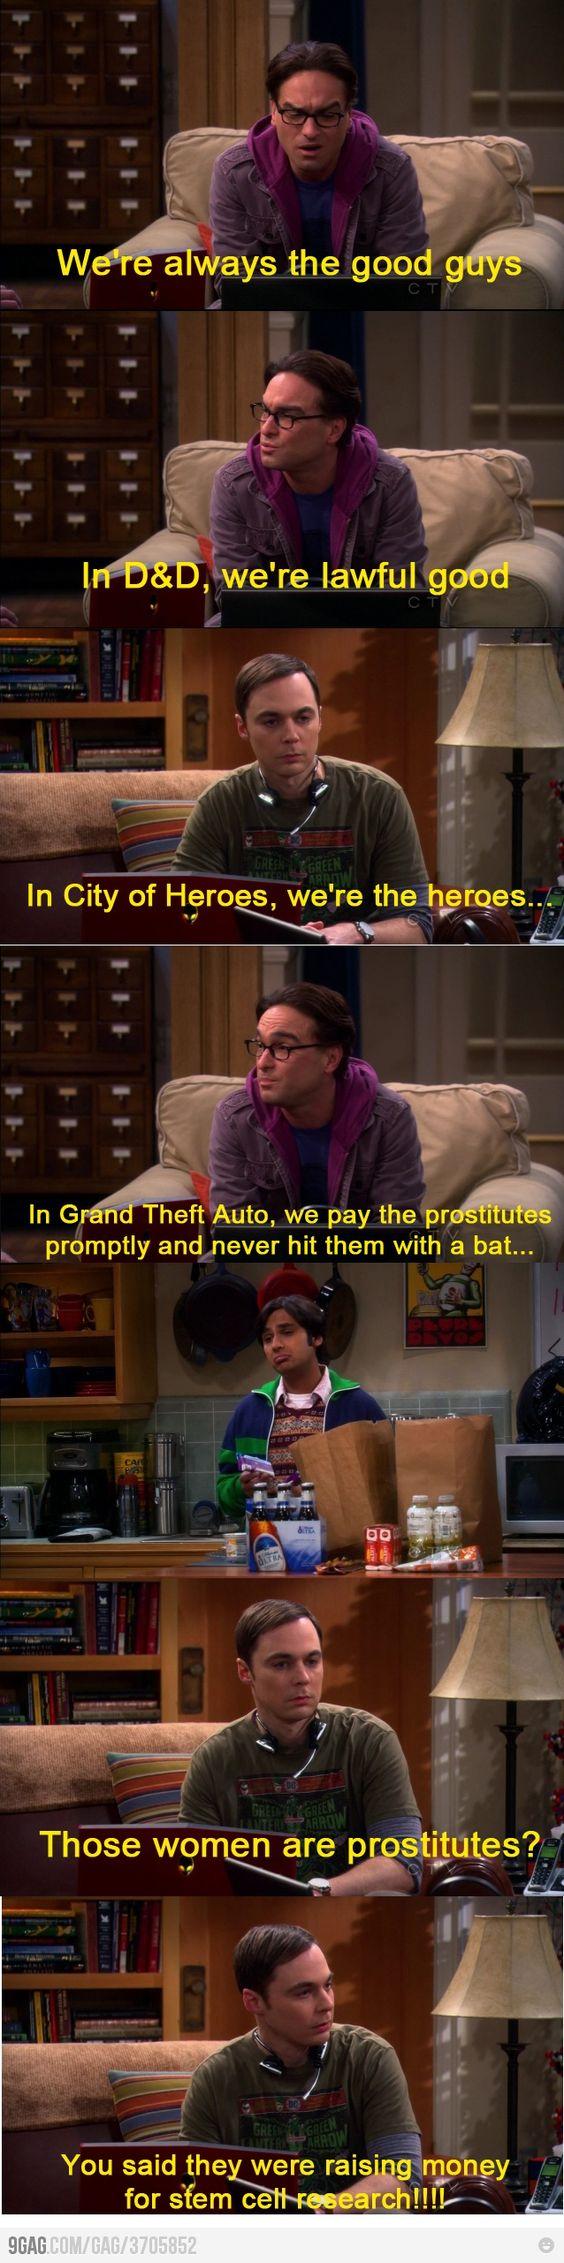 Just Sheldon Cooper